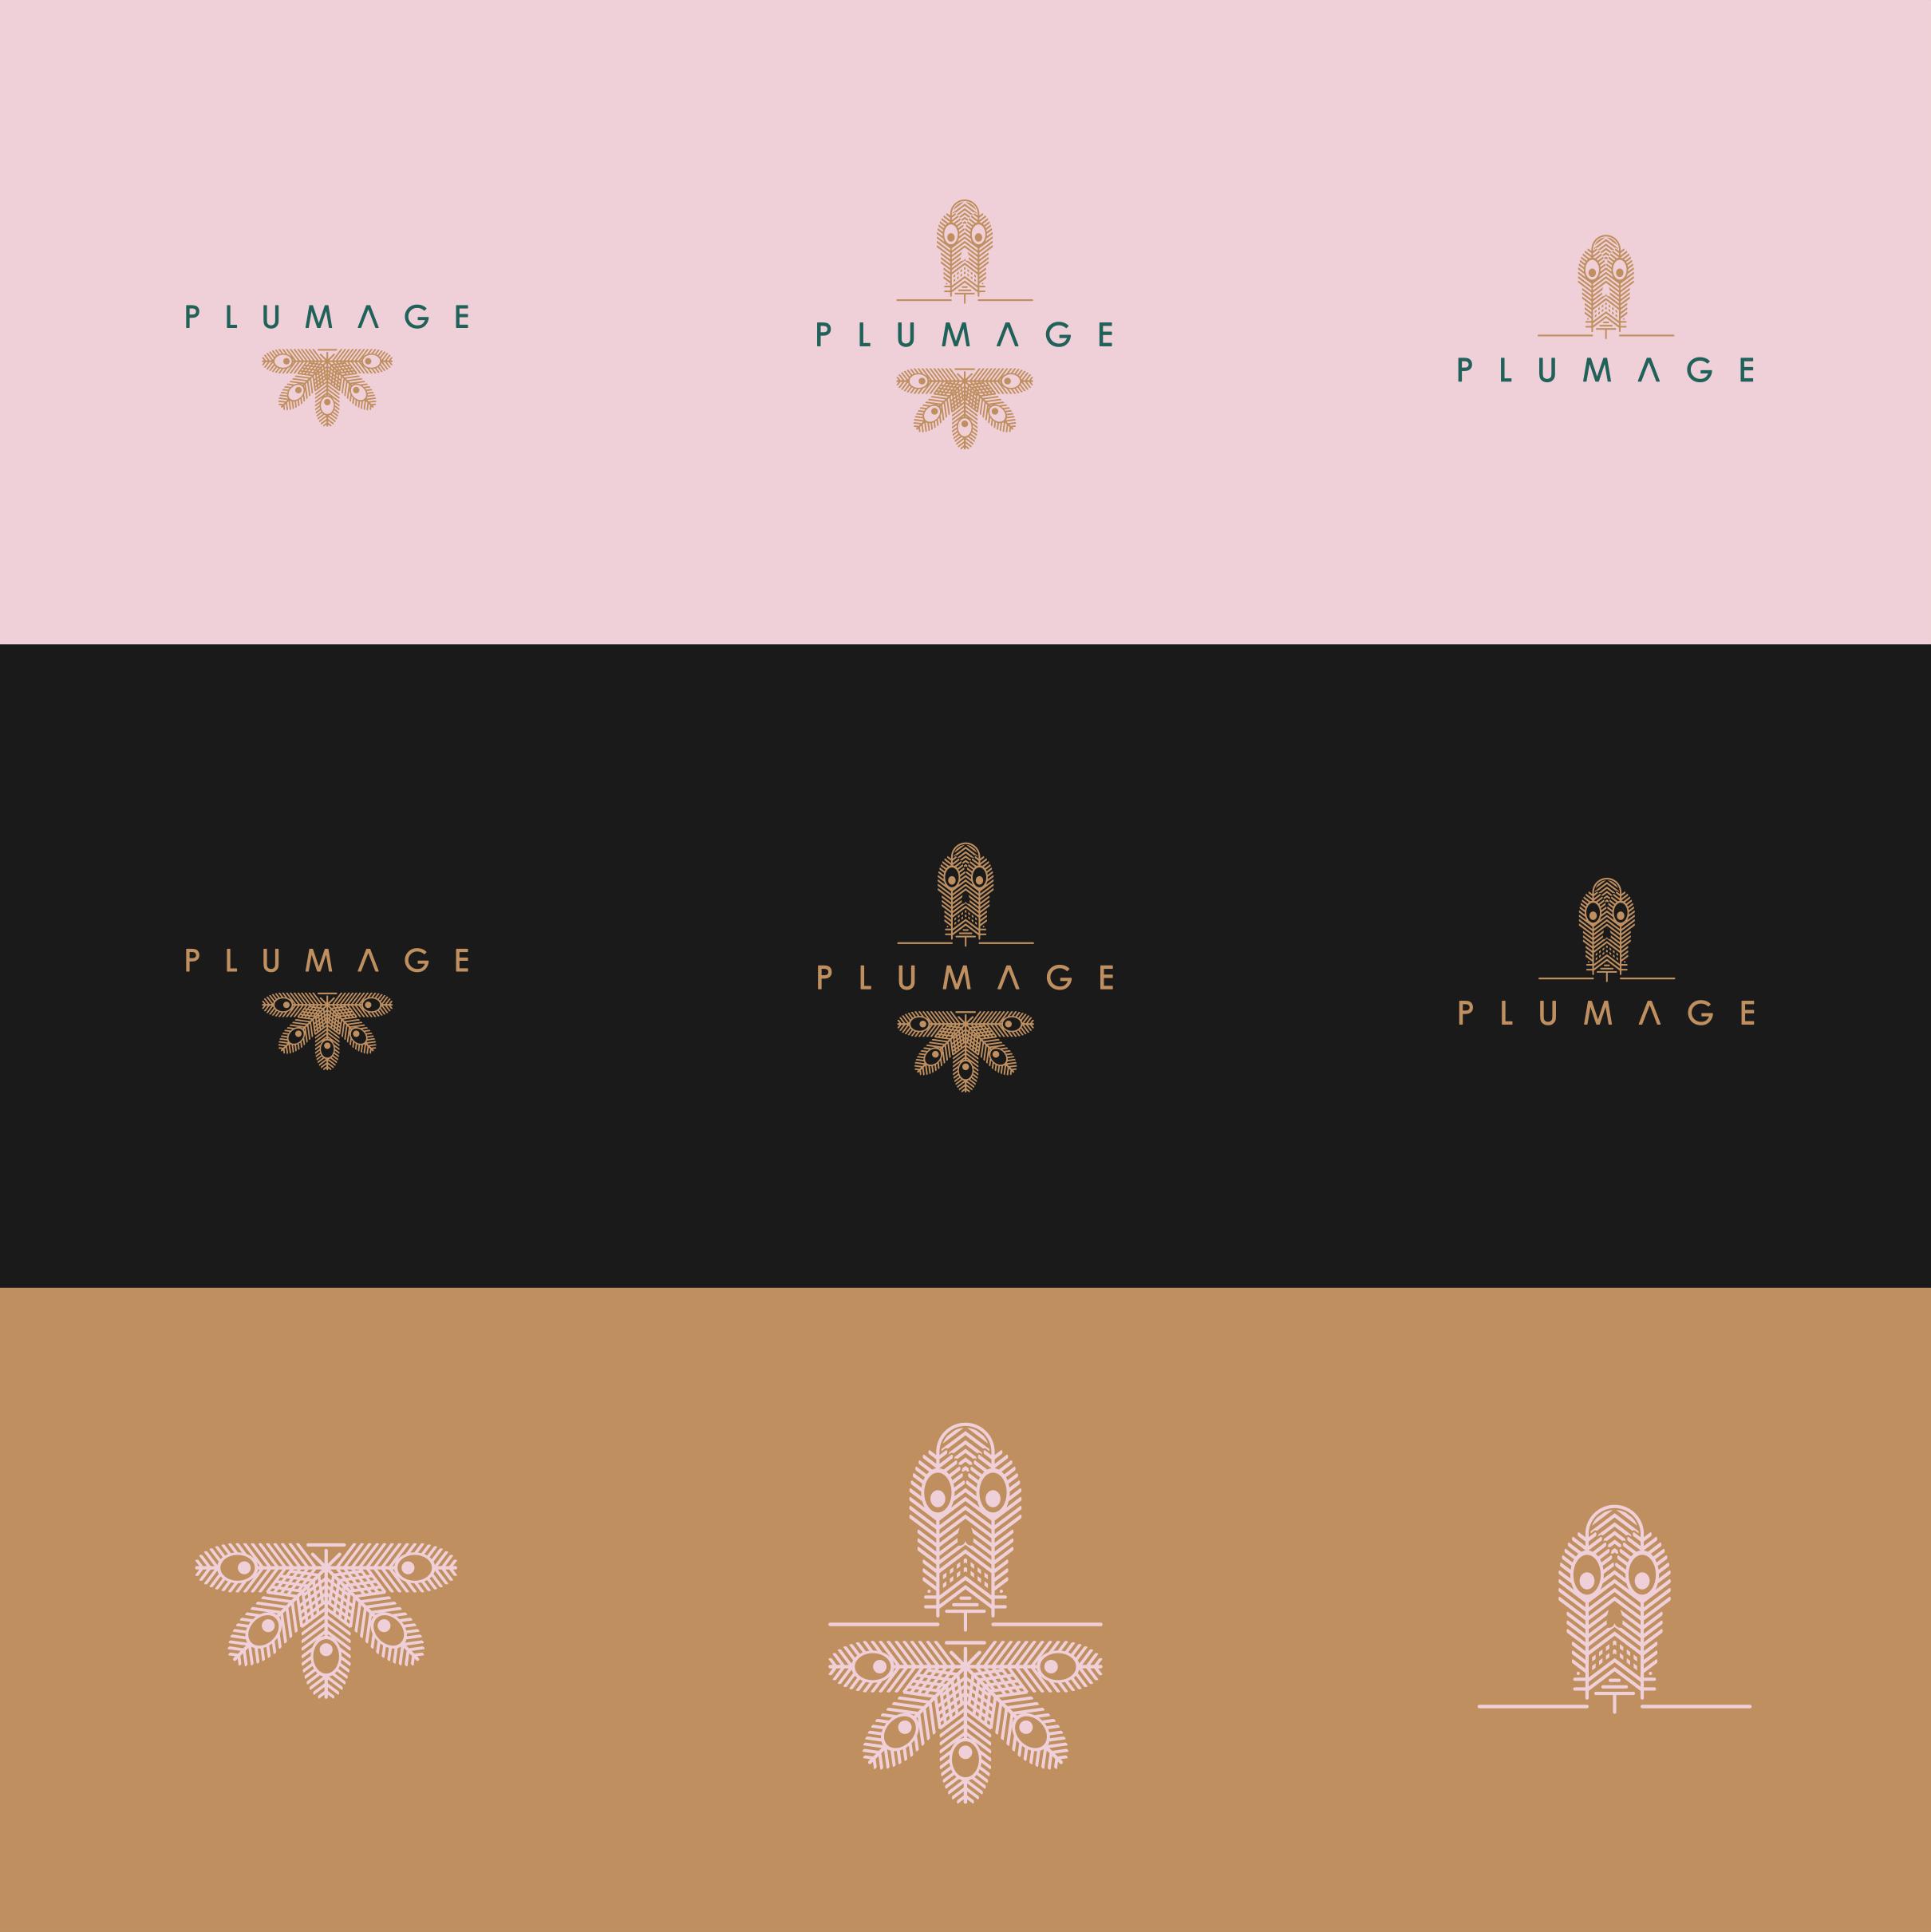 Design a bold logo for a unique luxury fashion jewelry/accessories website